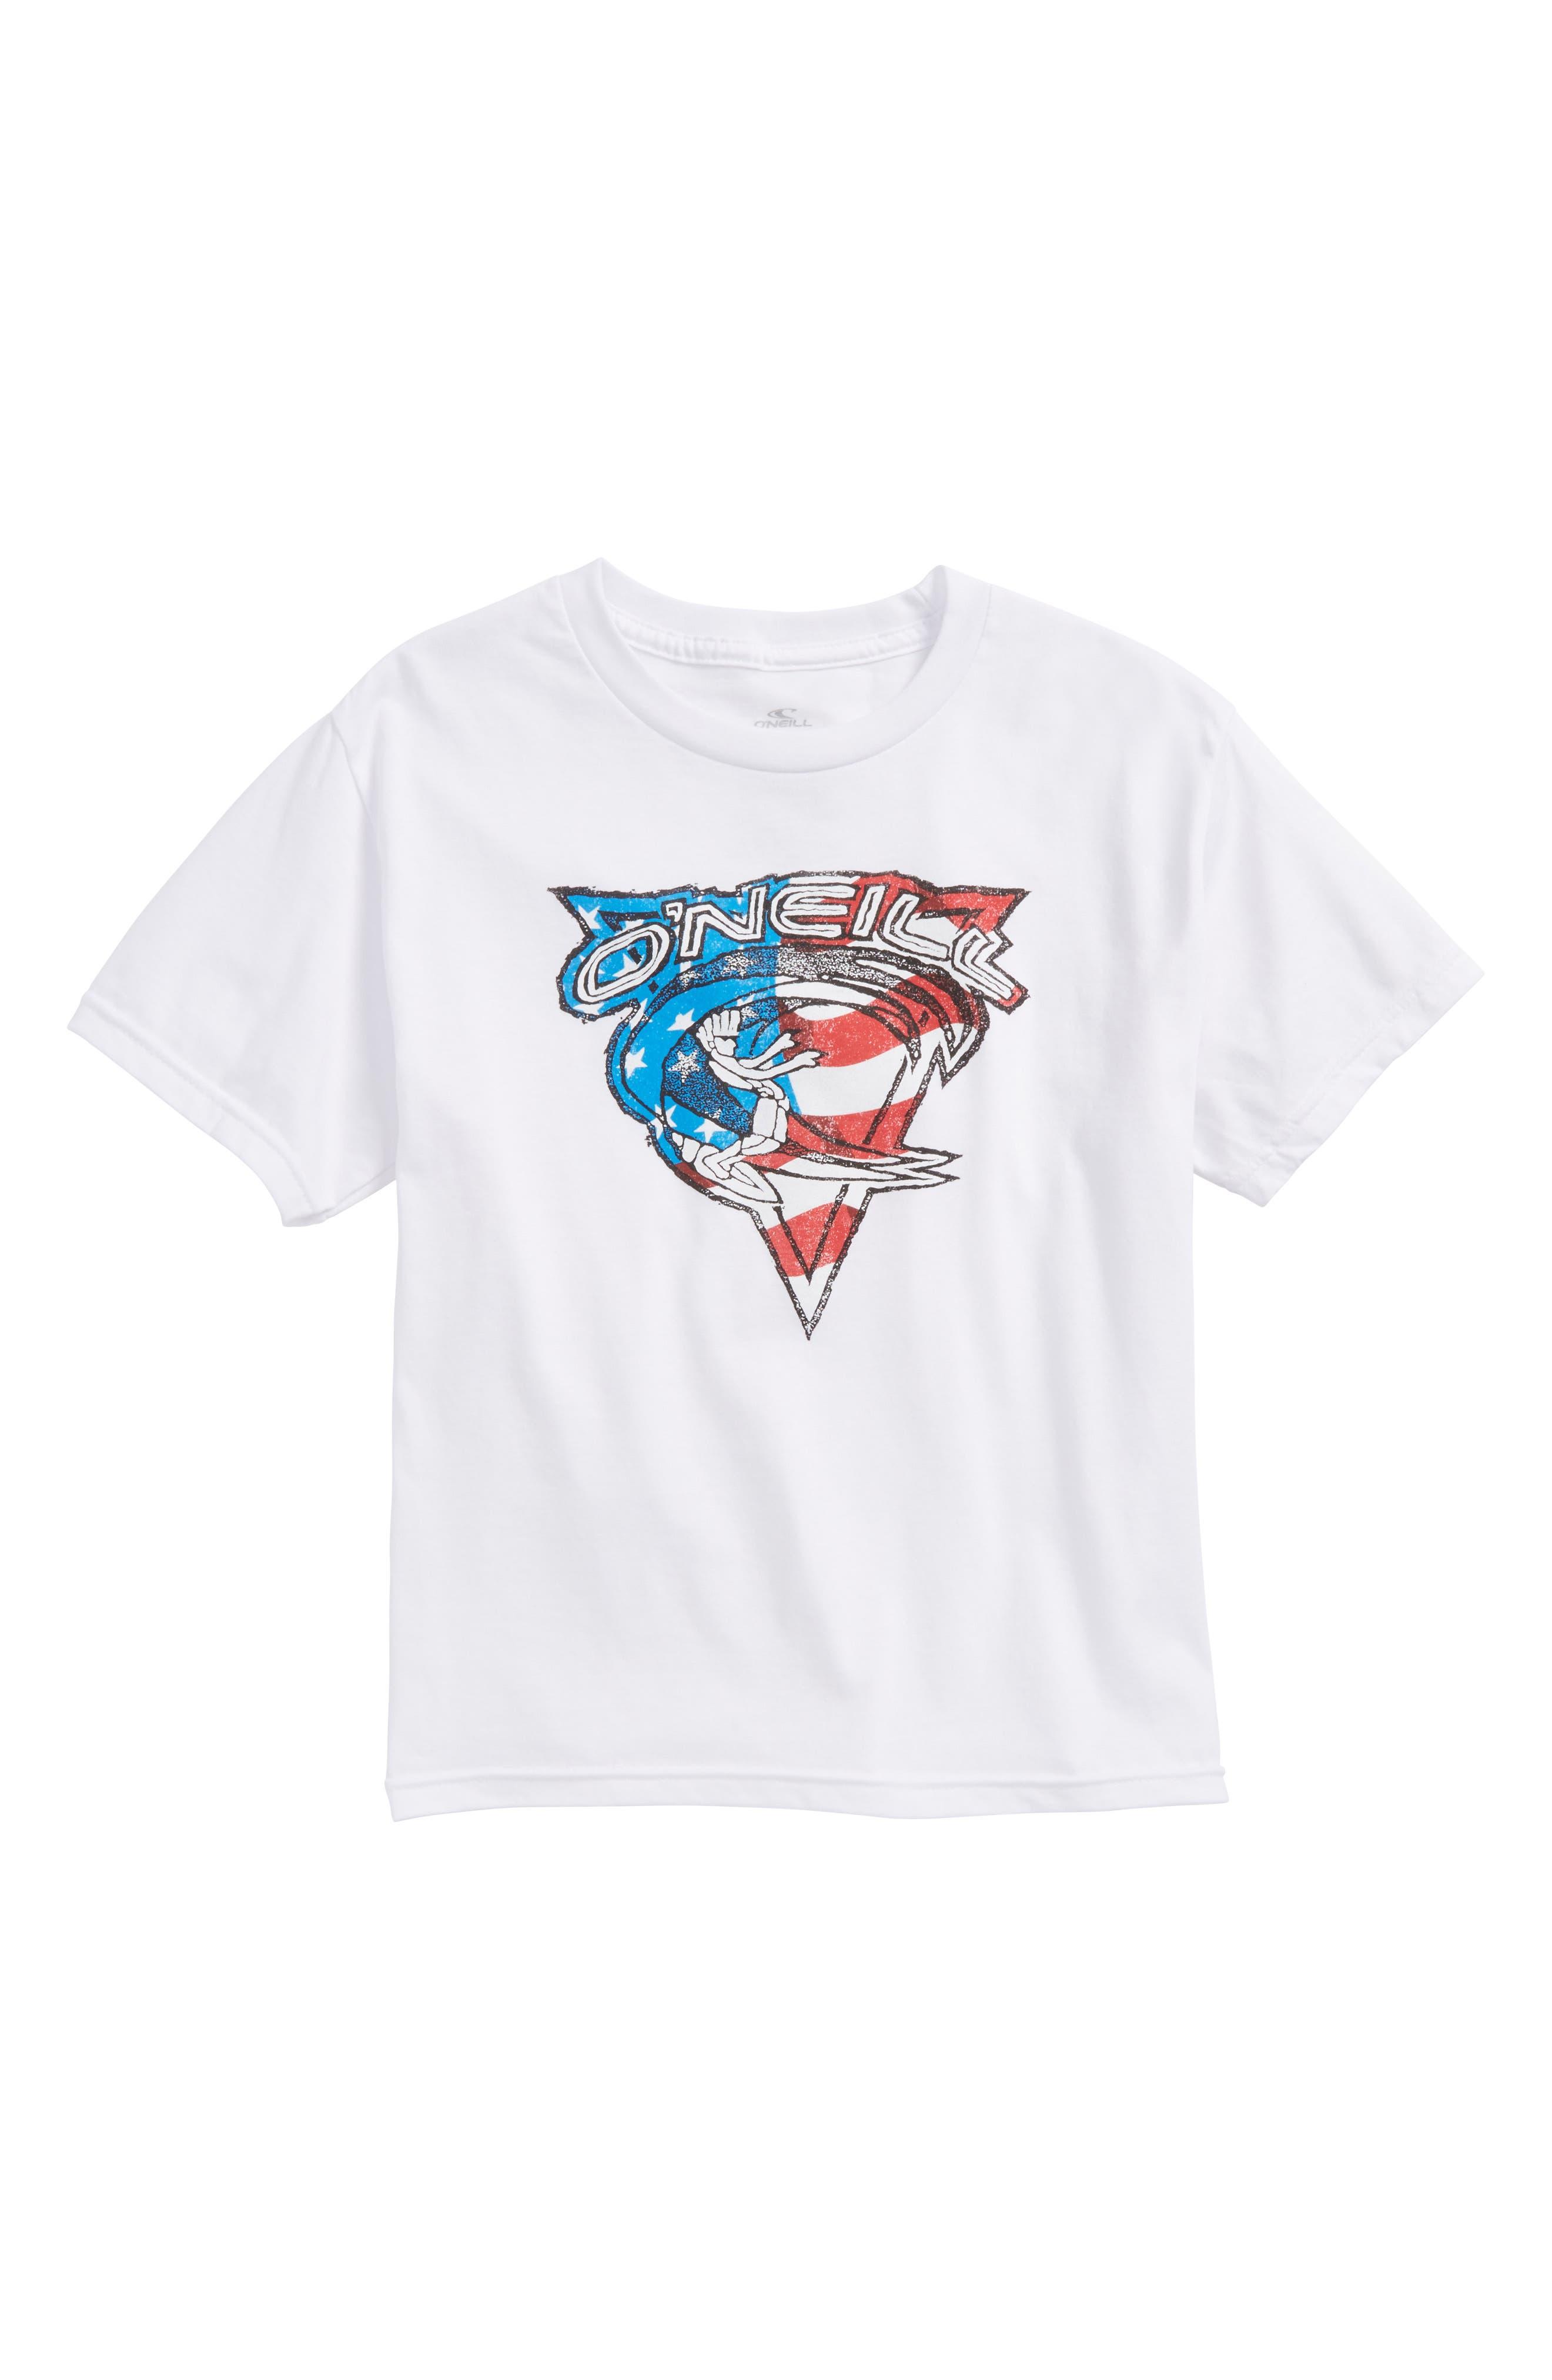 Patriot Graphic T-Shirt,                             Main thumbnail 1, color,                             White